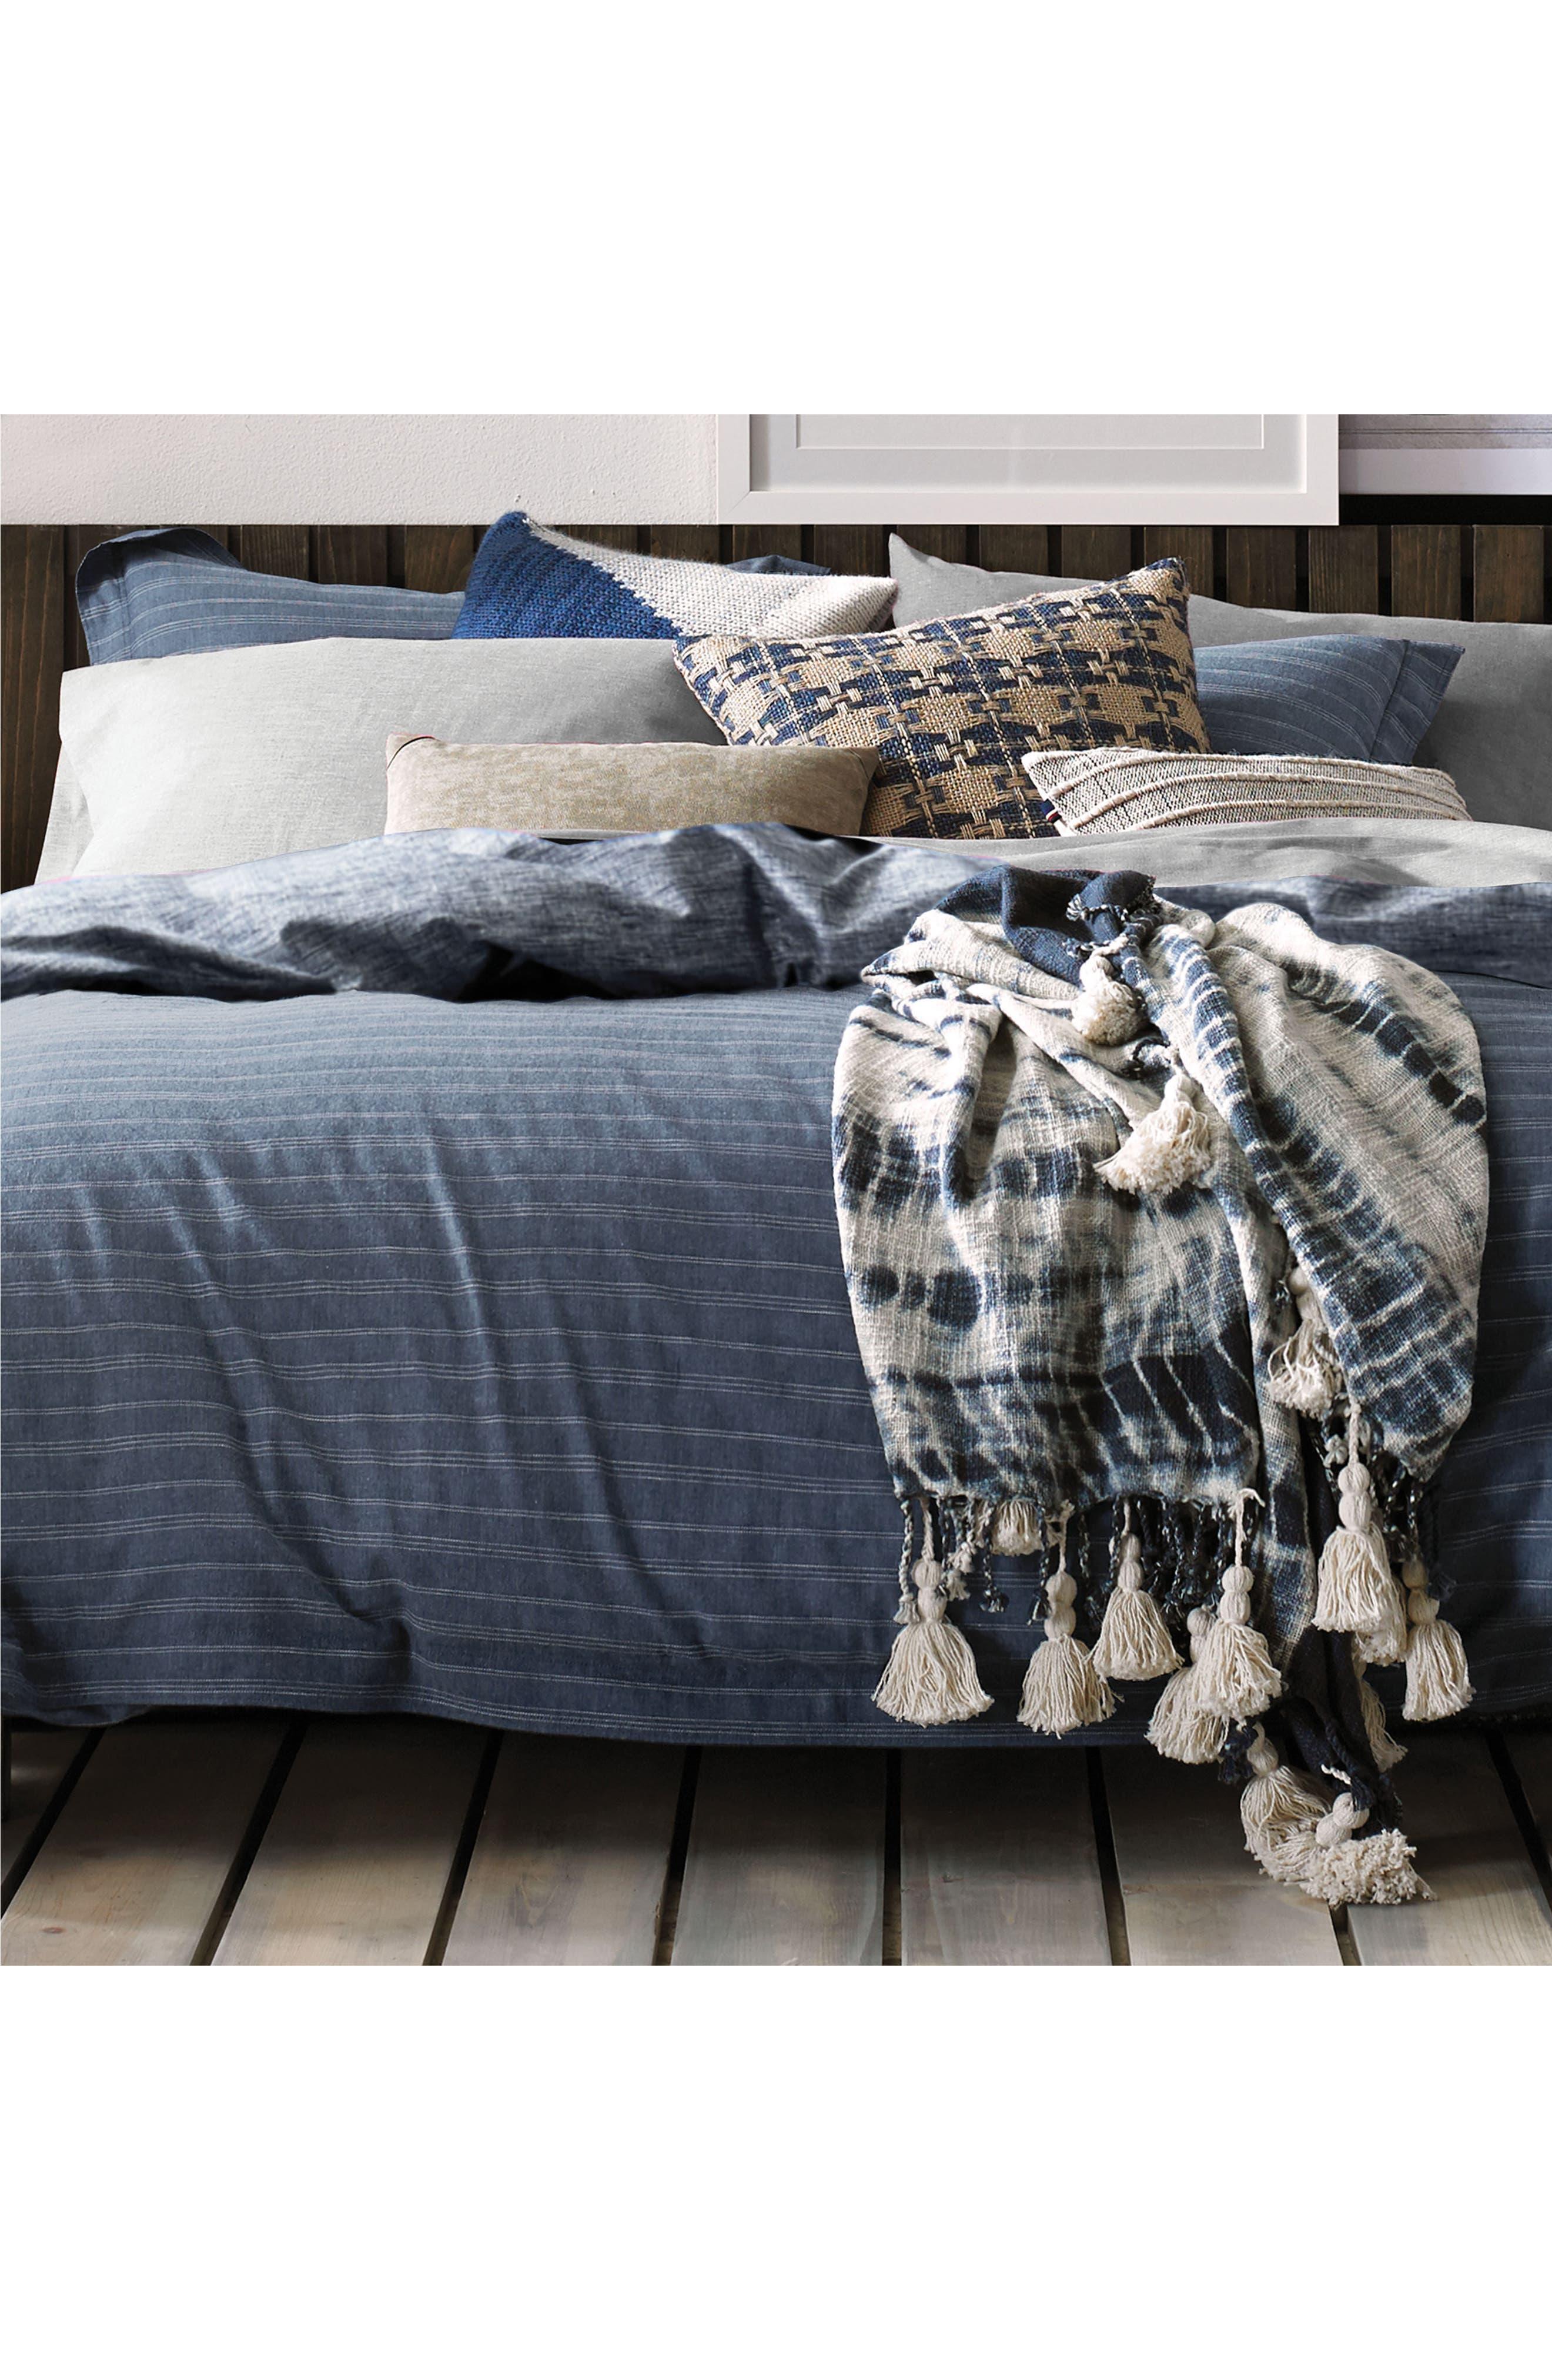 Vintage Pleated Comforter & Sham Set,                             Alternate thumbnail 2, color,                             Denim Blue